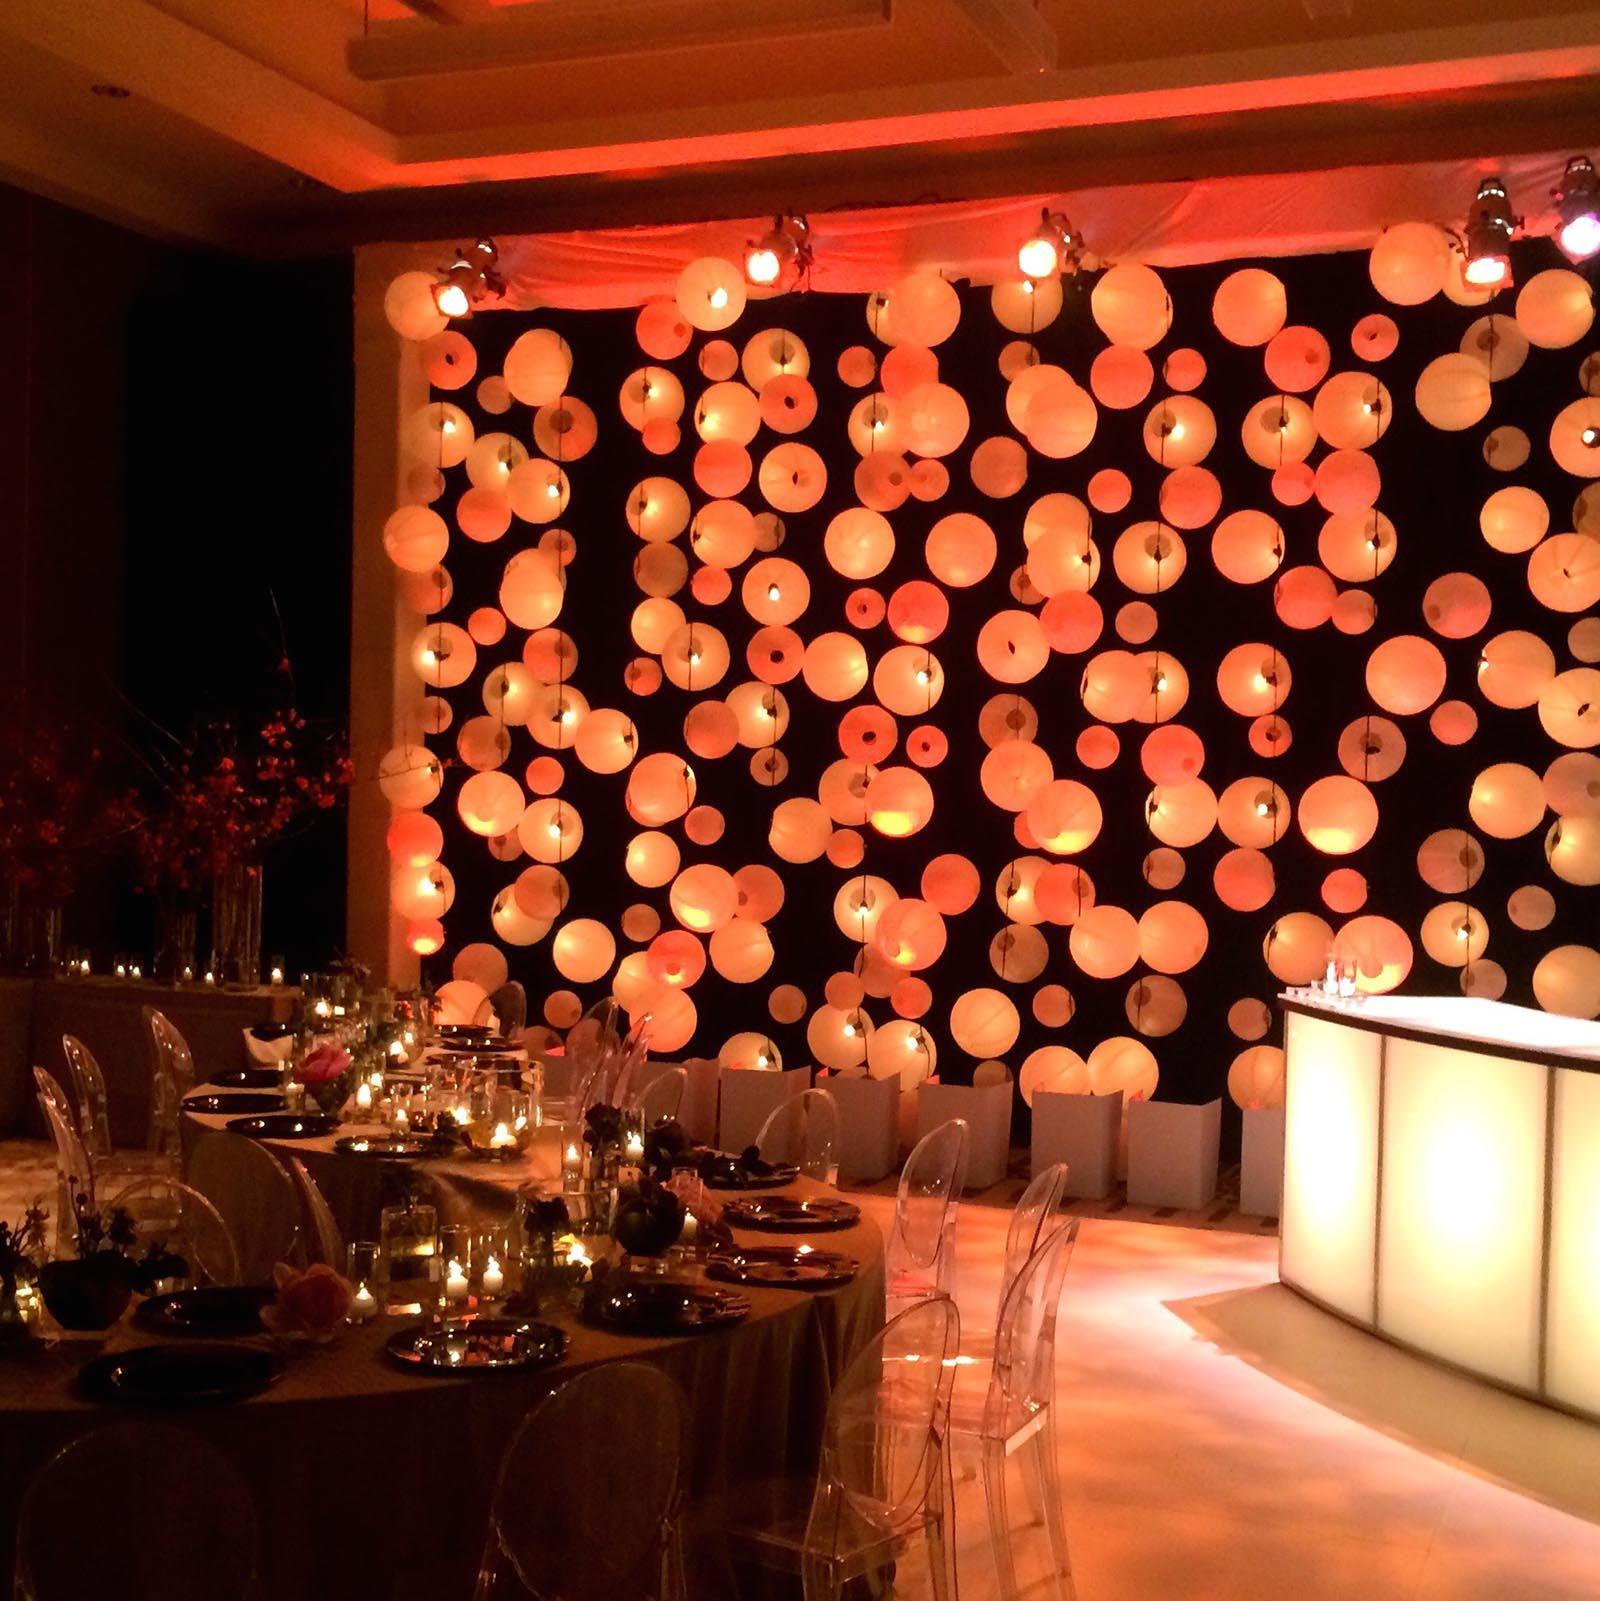 living grand | Diy wedding backdrop, Chinese wedding decor, Paper ...